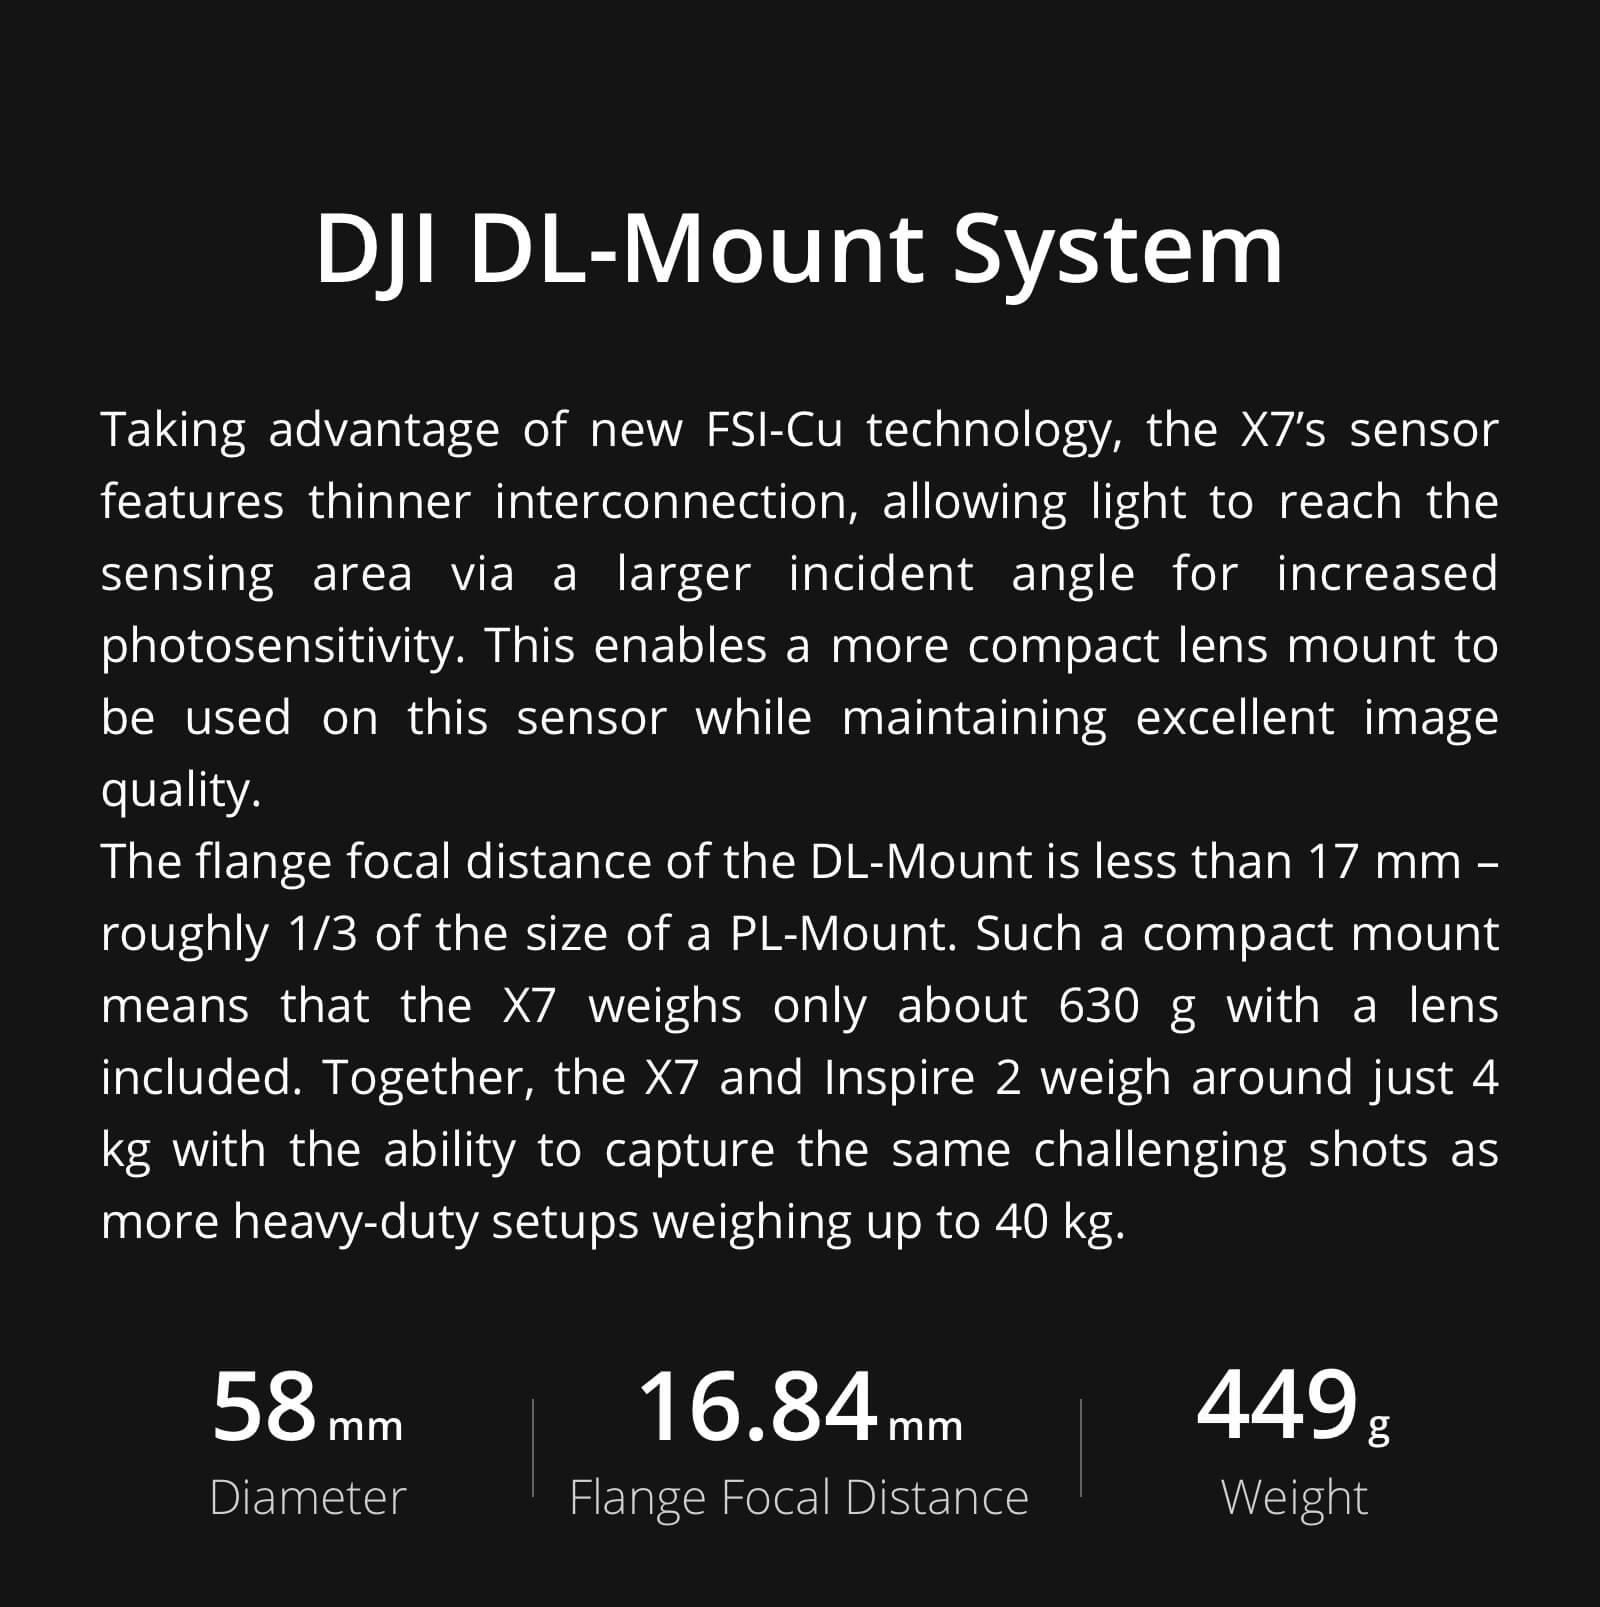 DJI Zenmuse X7 DL-Mount System